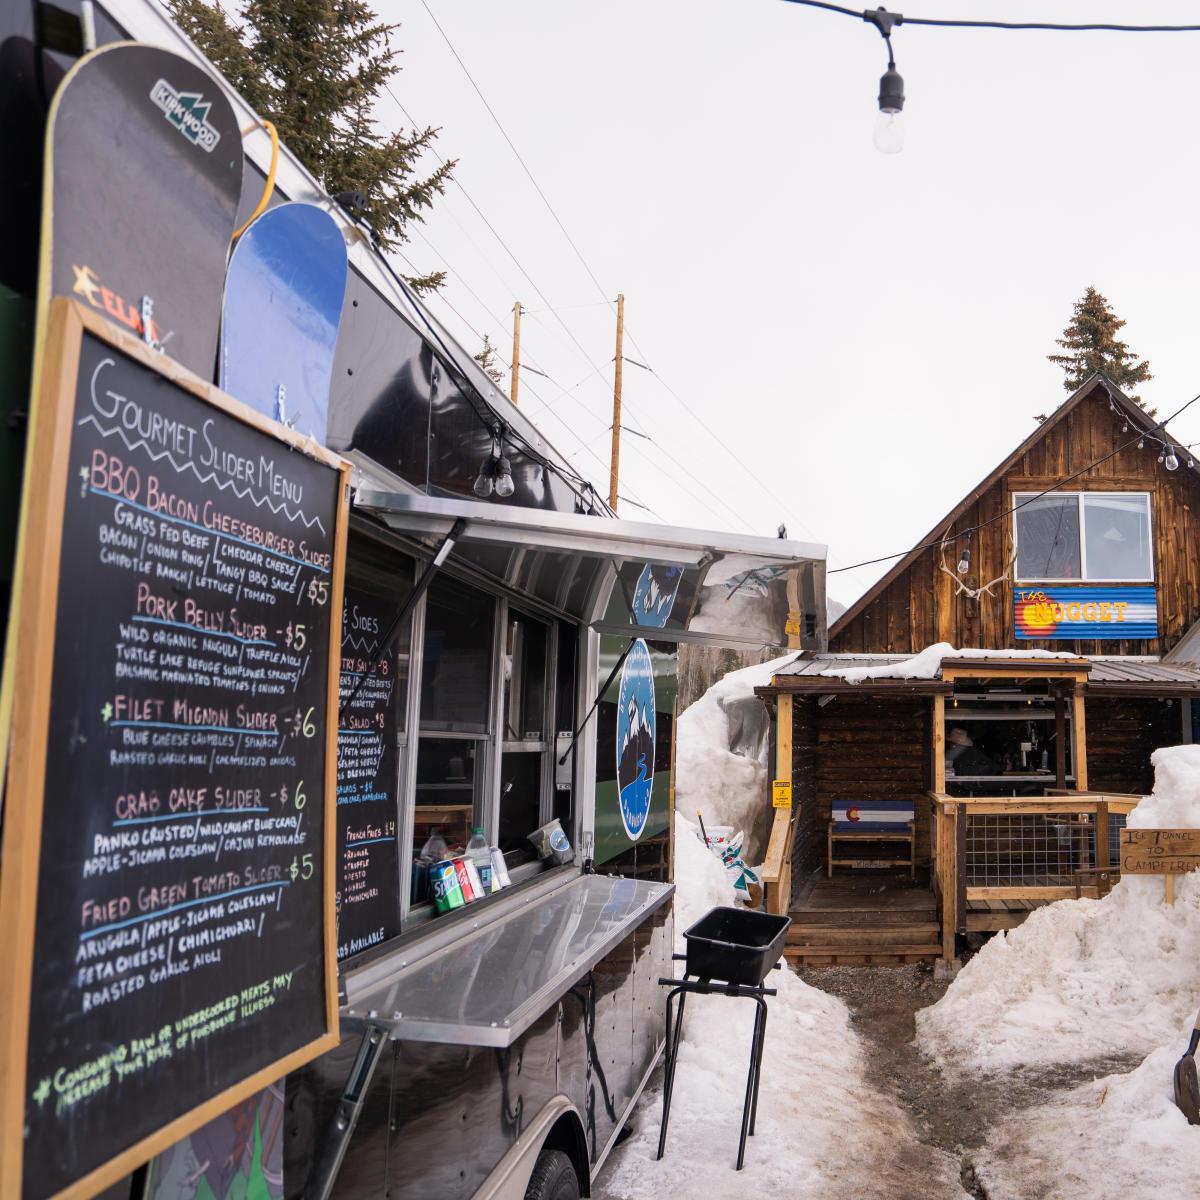 The Nugget Bar in Durango, CO